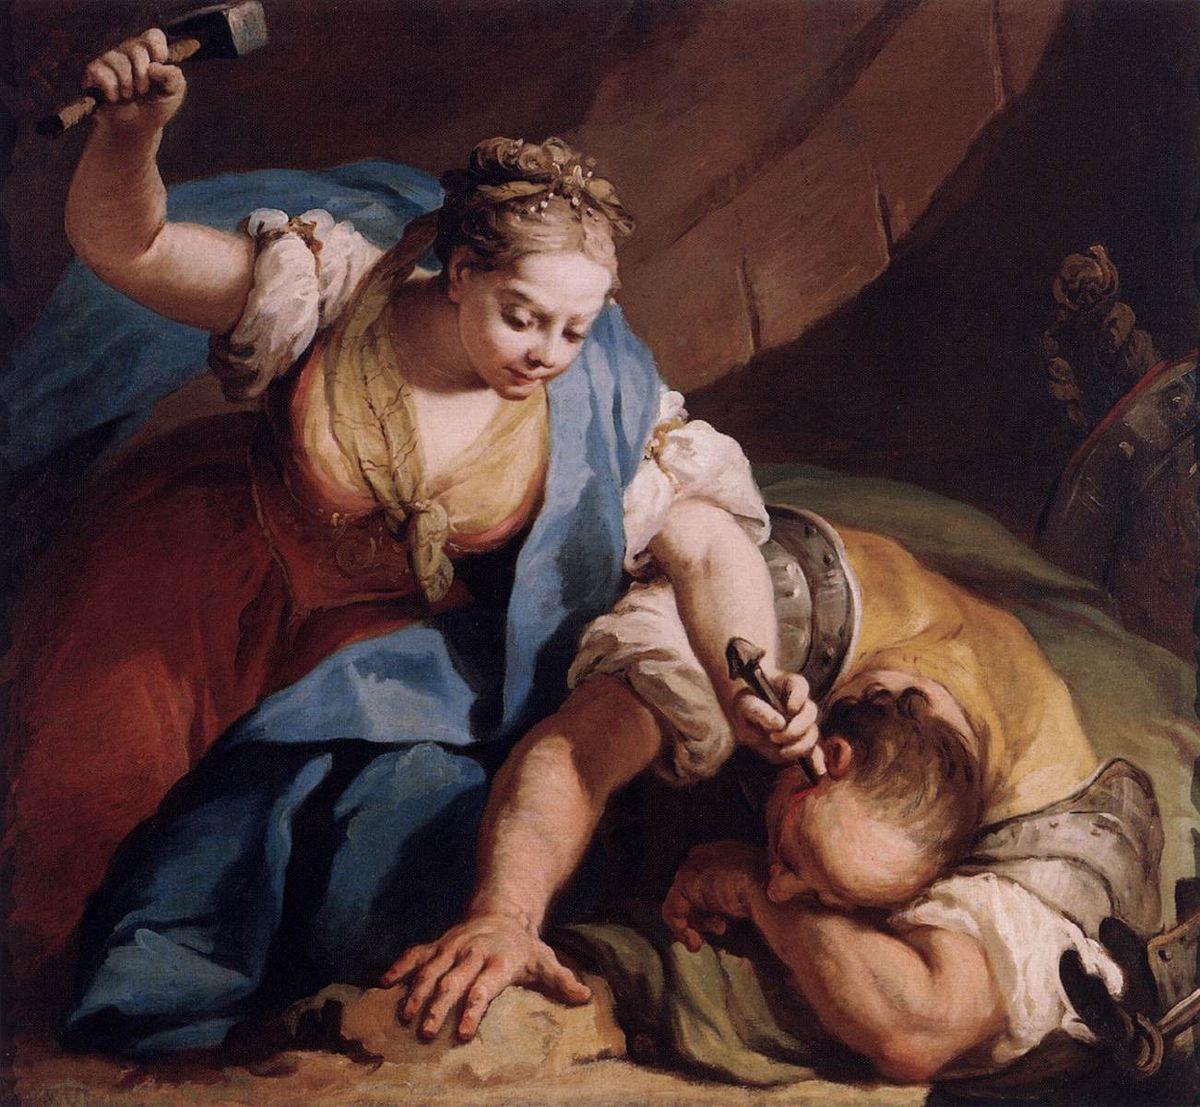 The Badass Women of the Bible